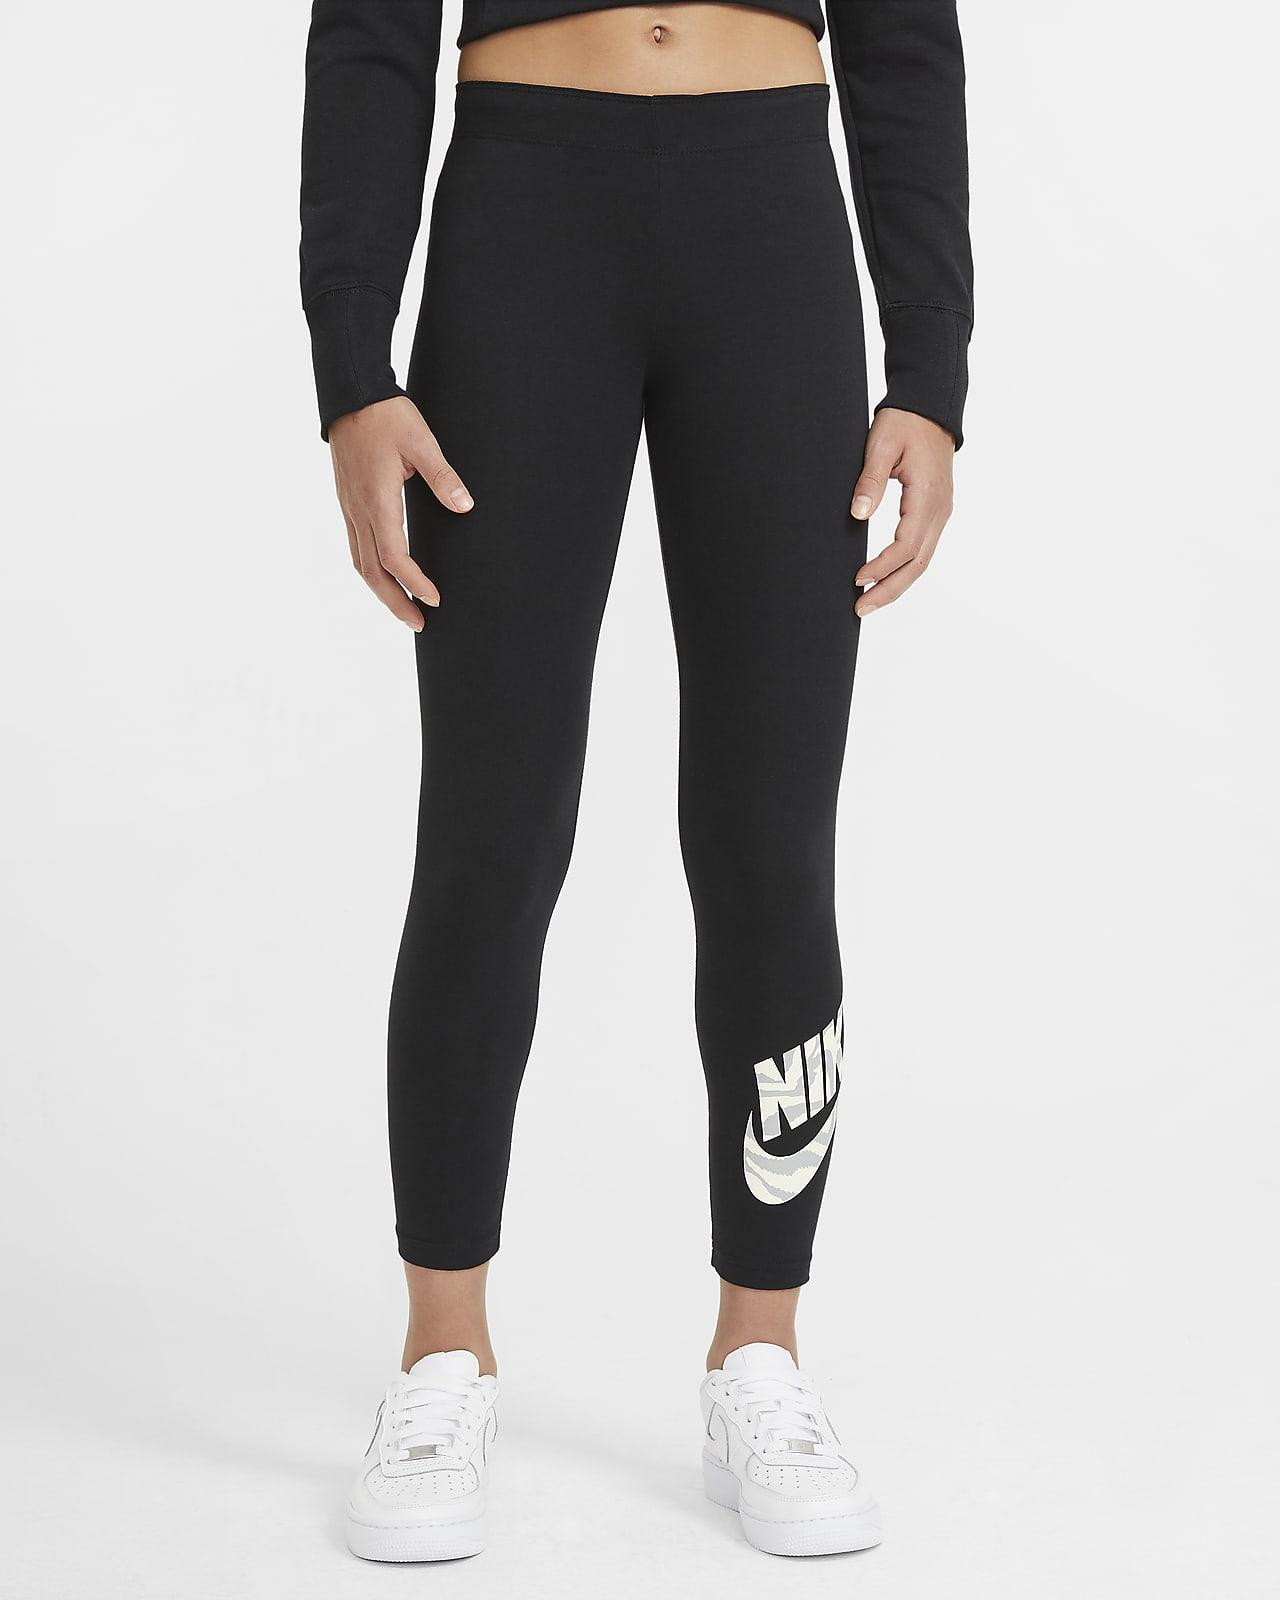 Leggings Nike Sportswear Favorites med tryck för ungdom (tjejer)